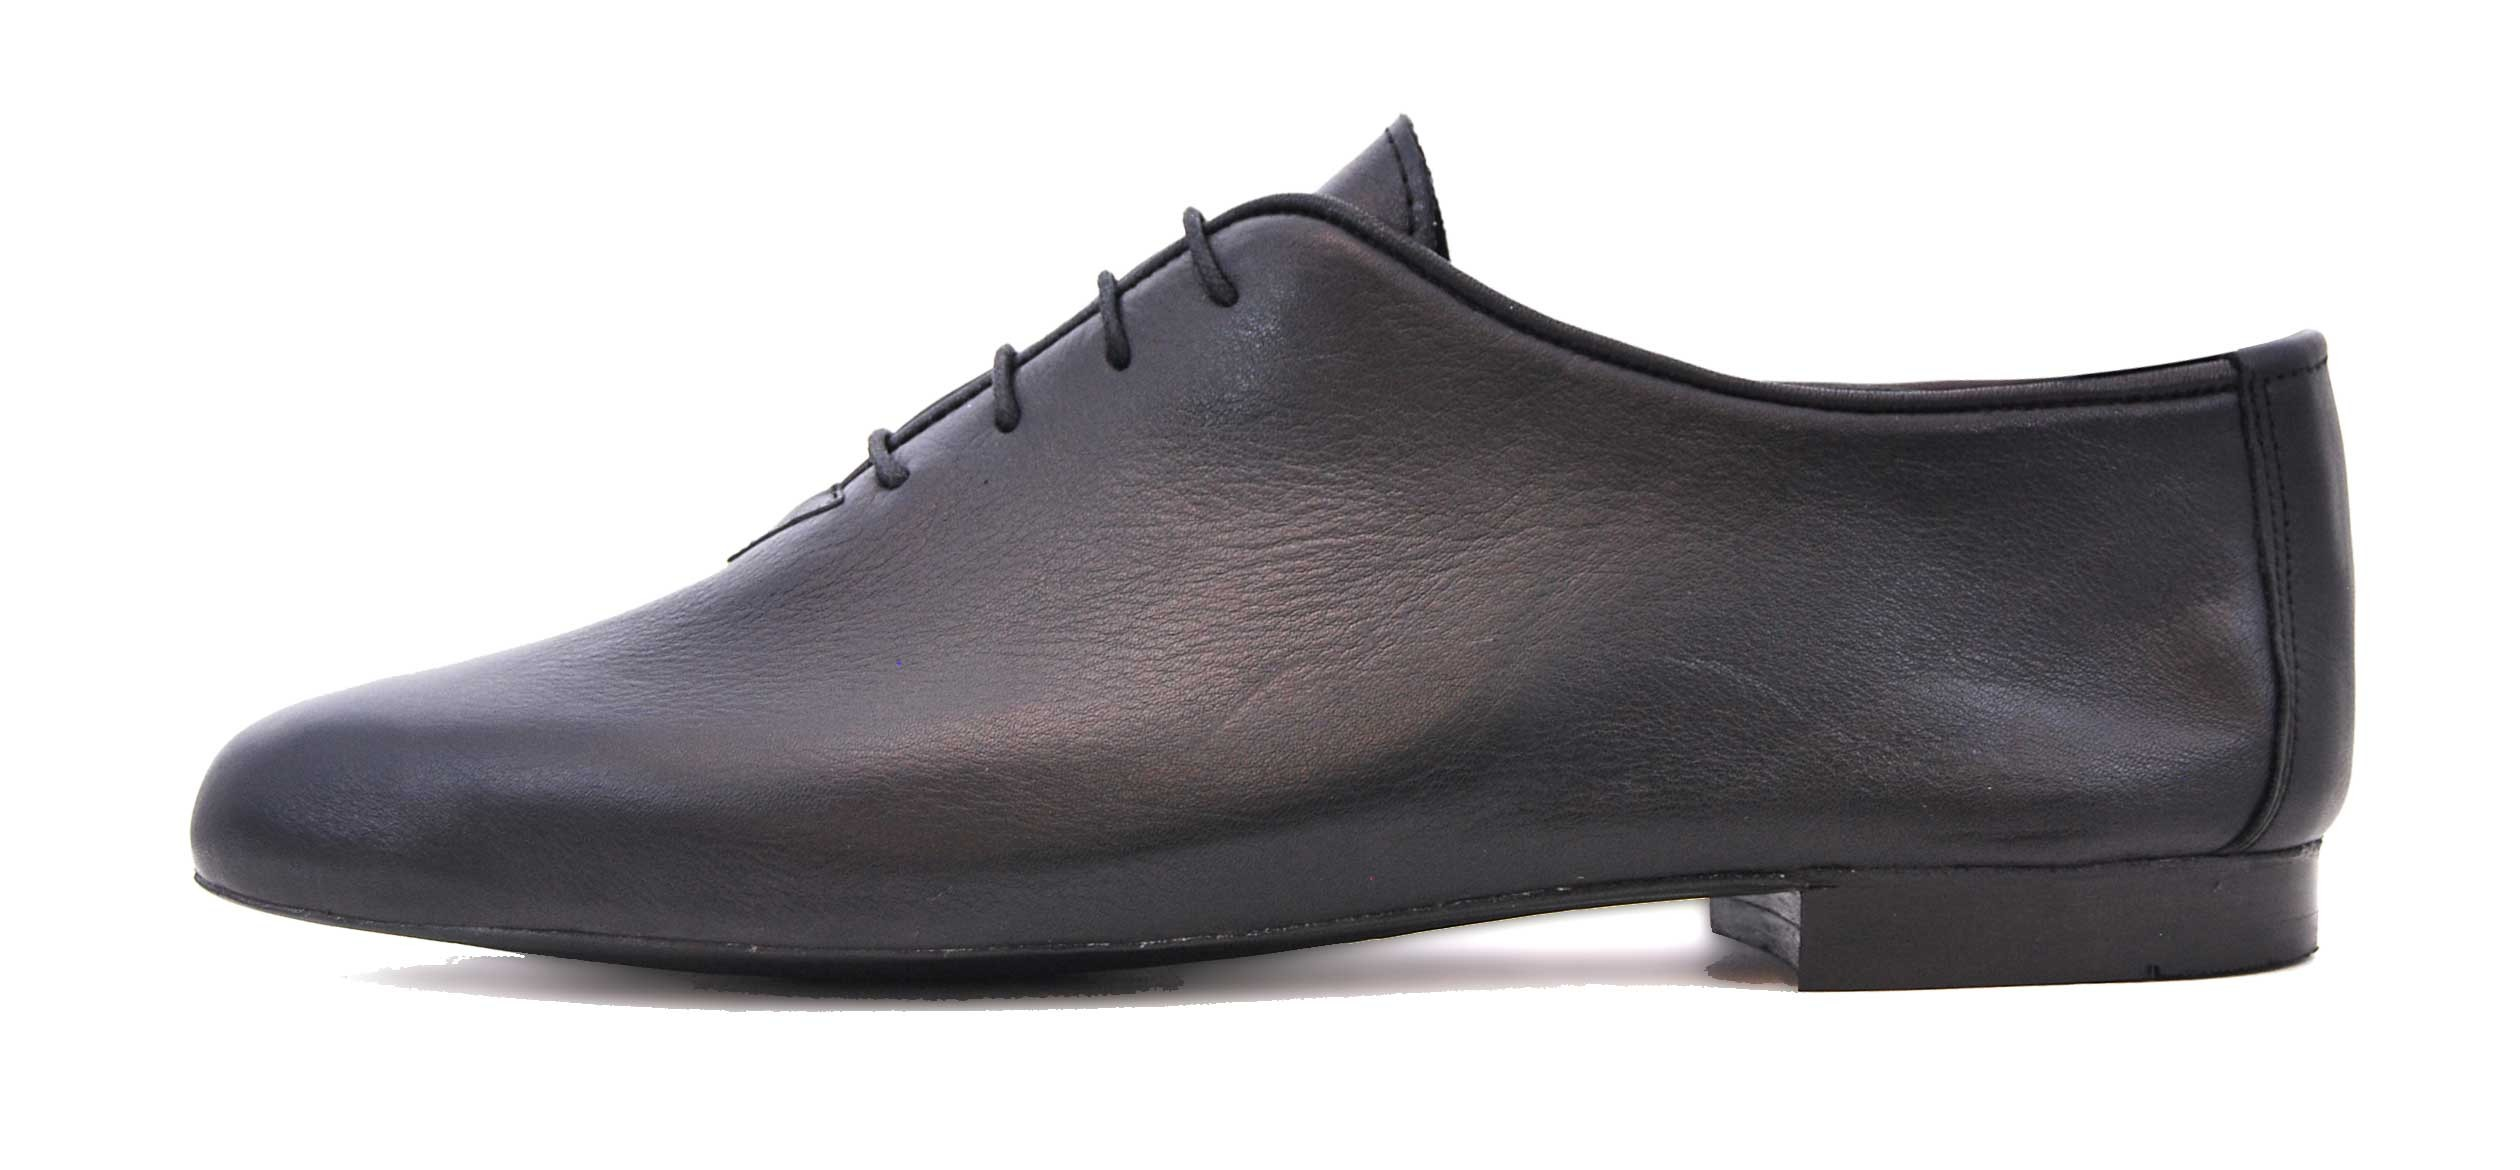 Foto 1 de Zapatos Julio Iglesias Cordon 529 JC Negro Napa